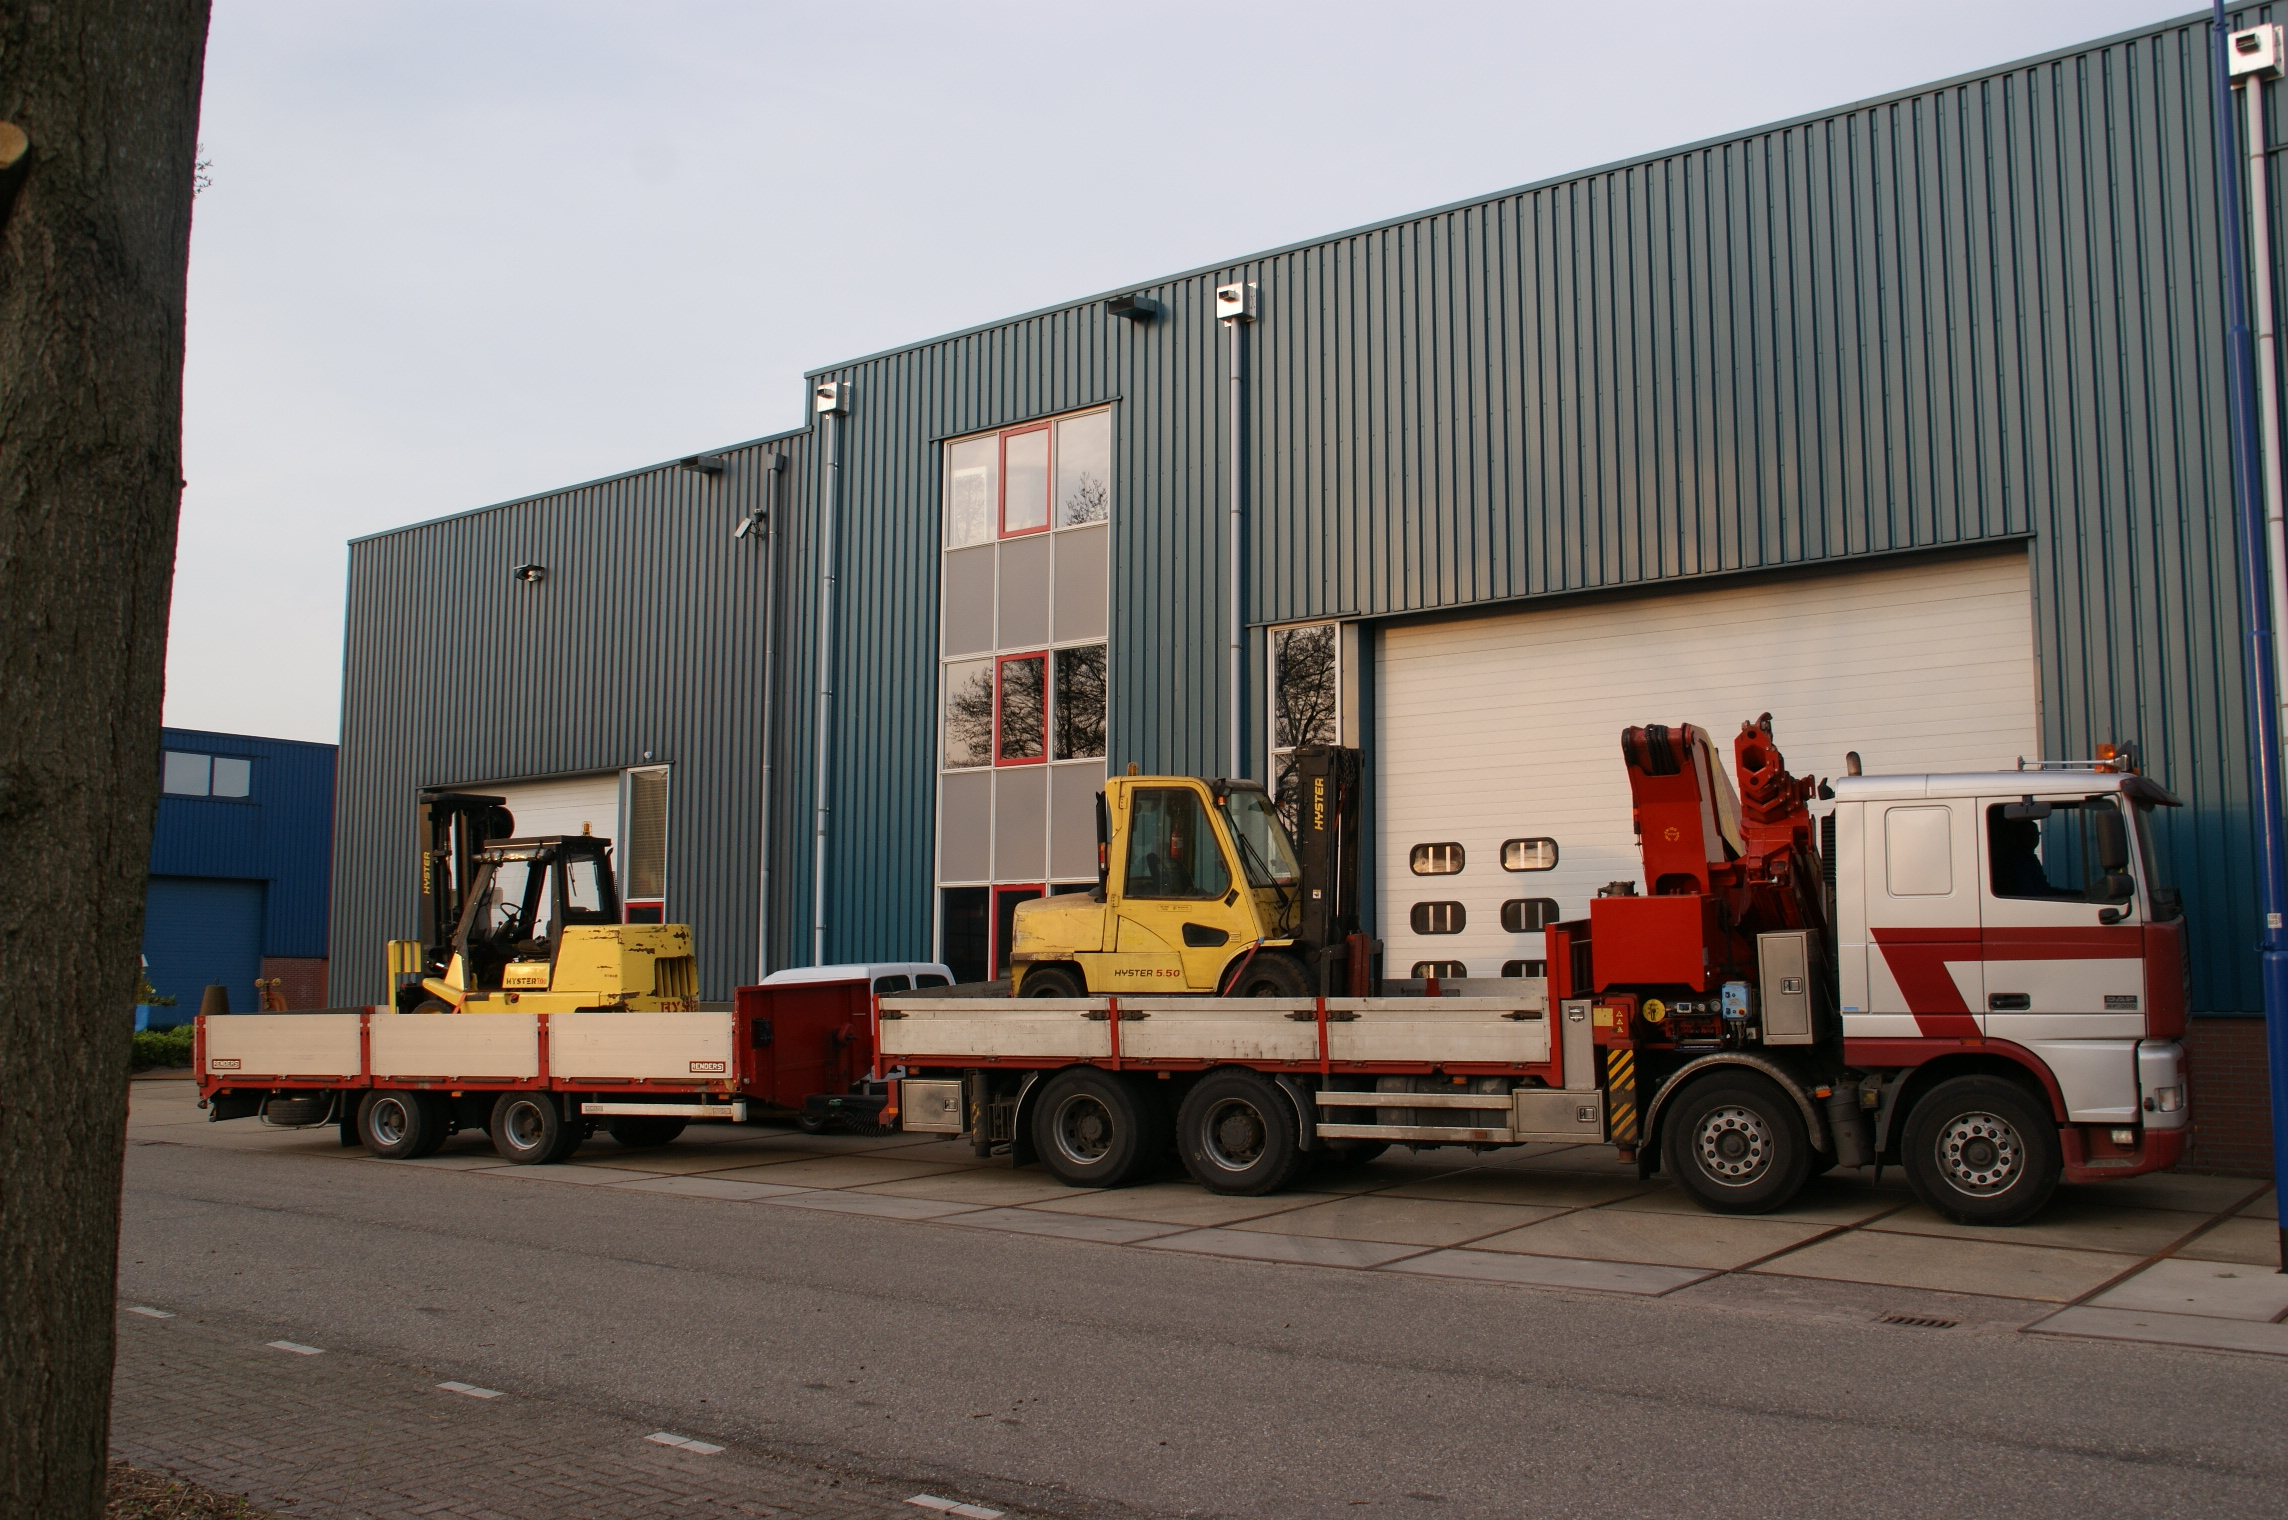 Autolaadkraan transport heftrucks